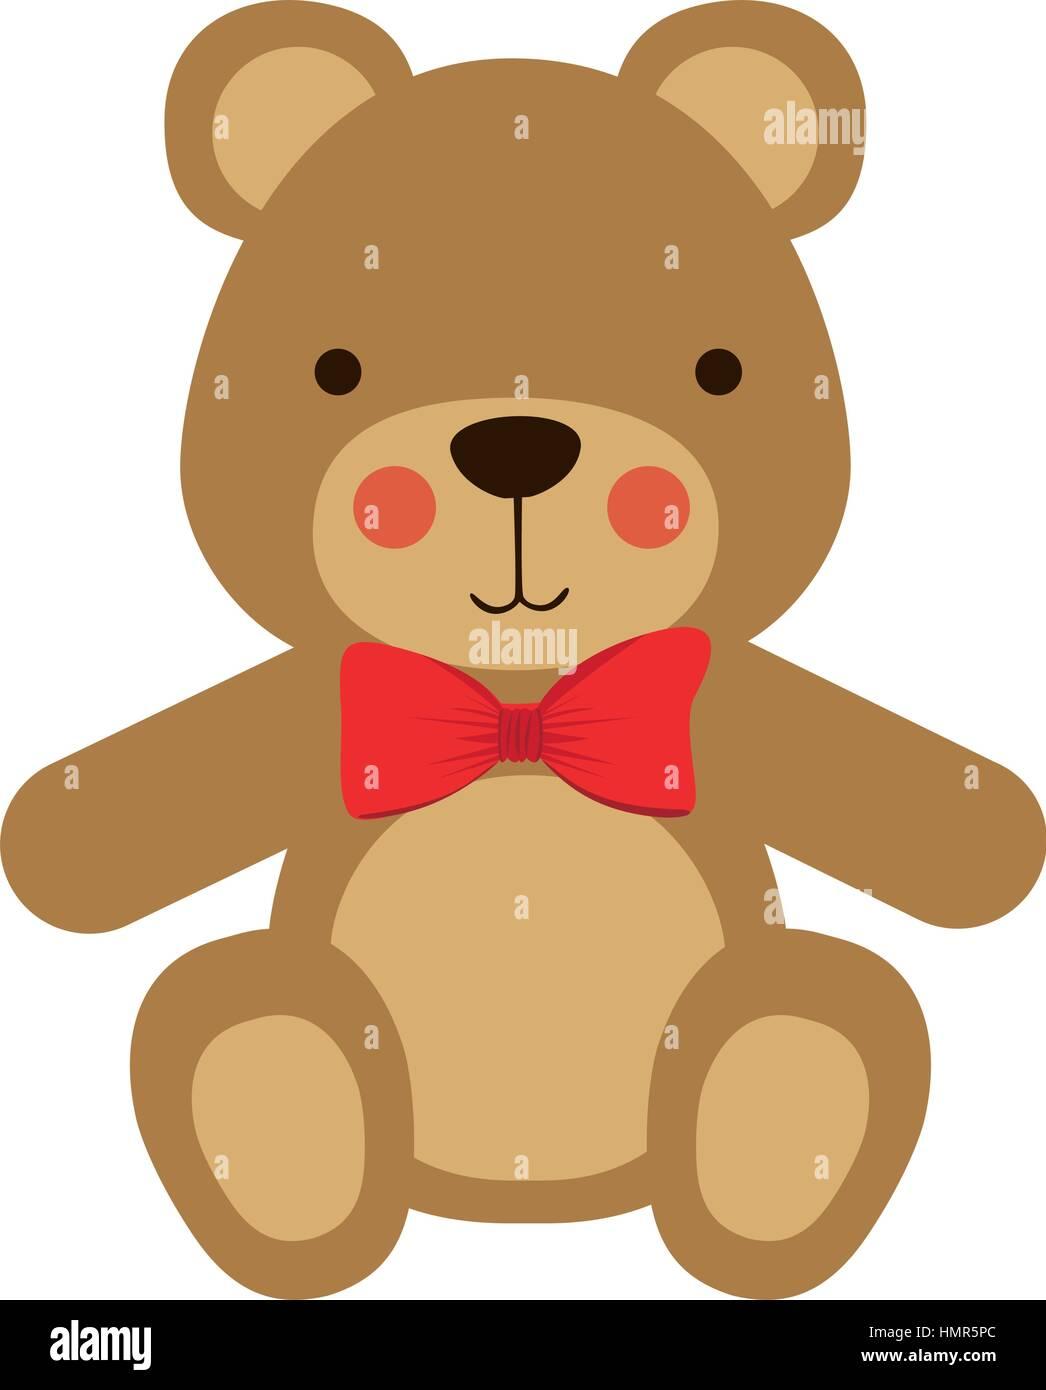 Cute Teddy Bear Icon Vector Illustration Graphic Design Stock